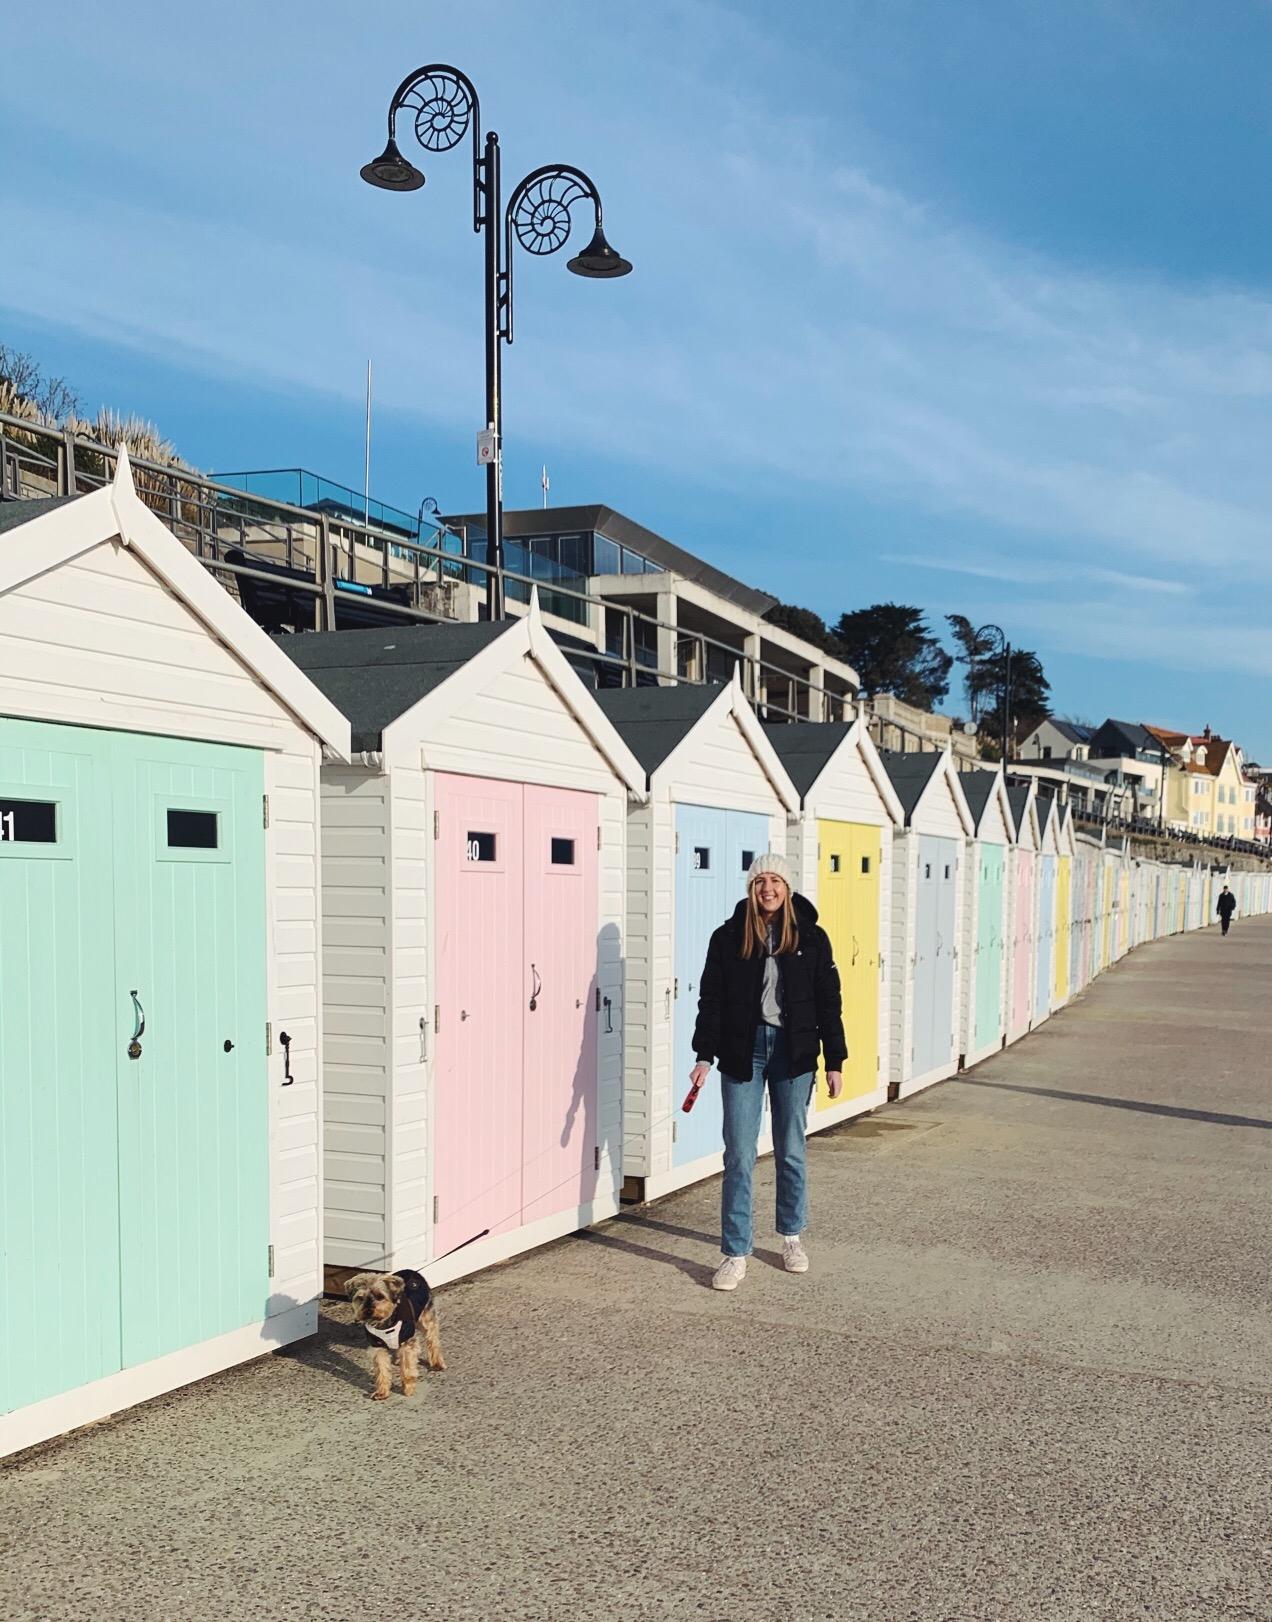 Lyme Regis Dorset beach huts girl yorkshire terrier